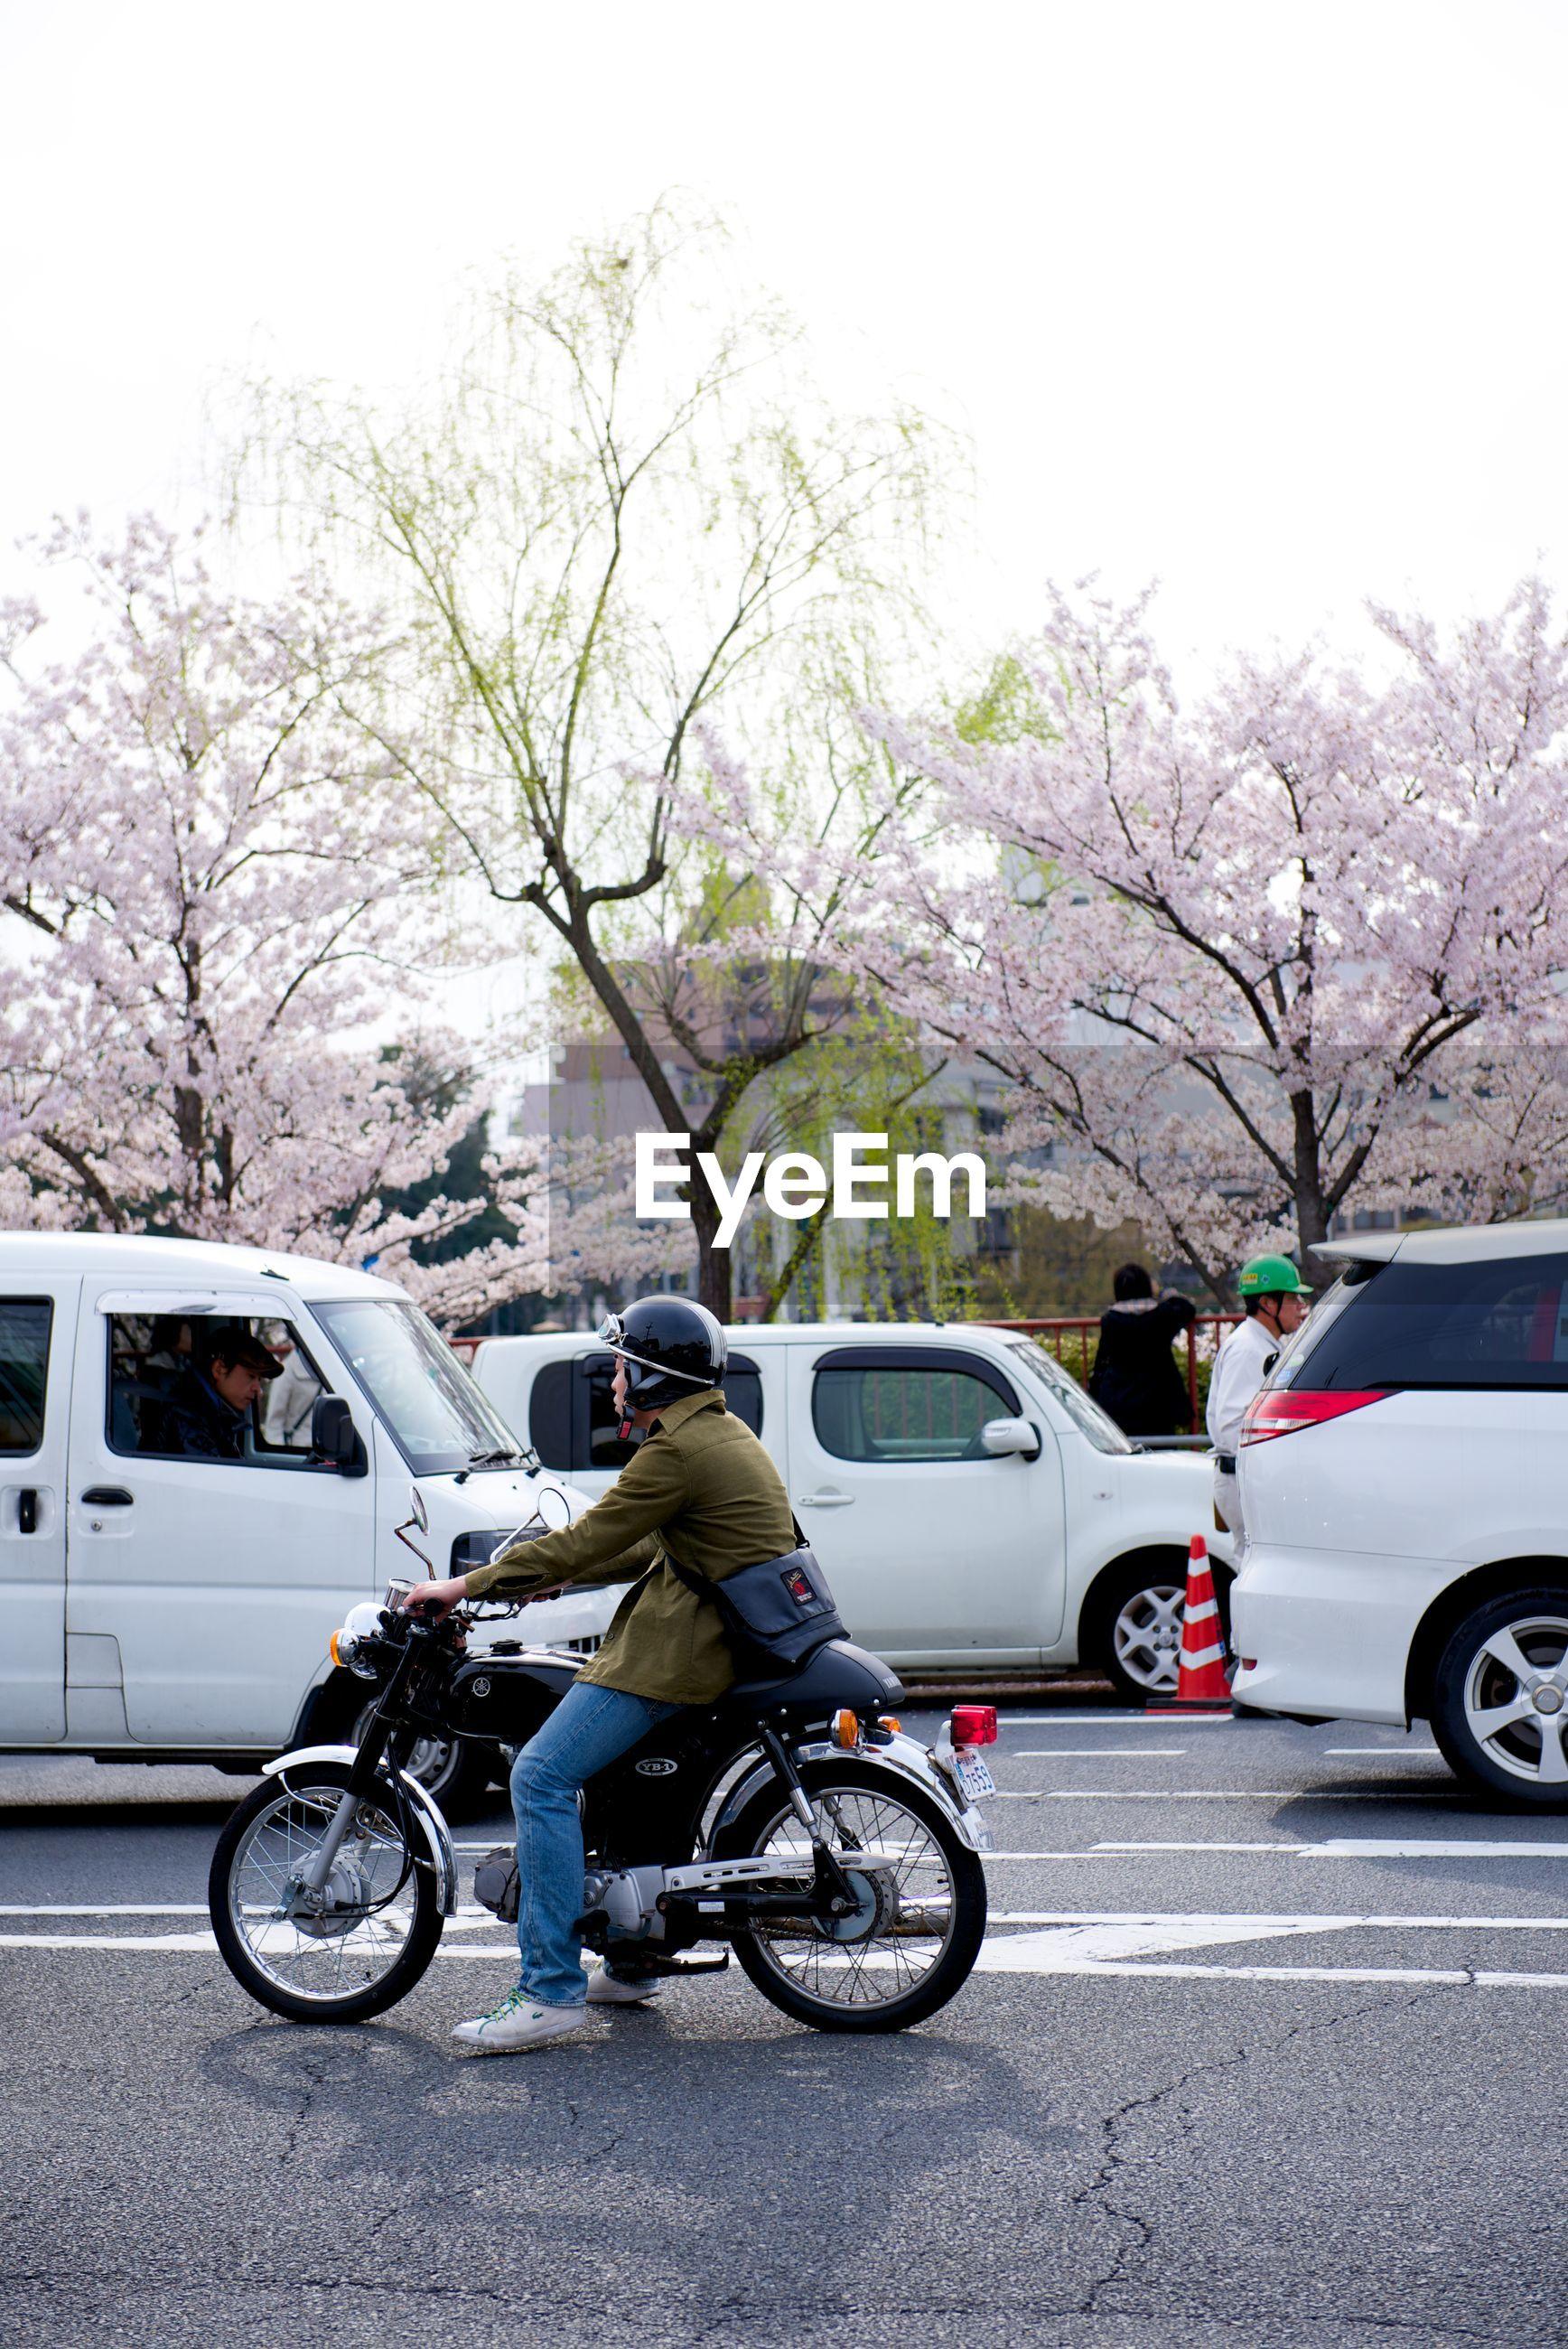 Man on motorbike on city street